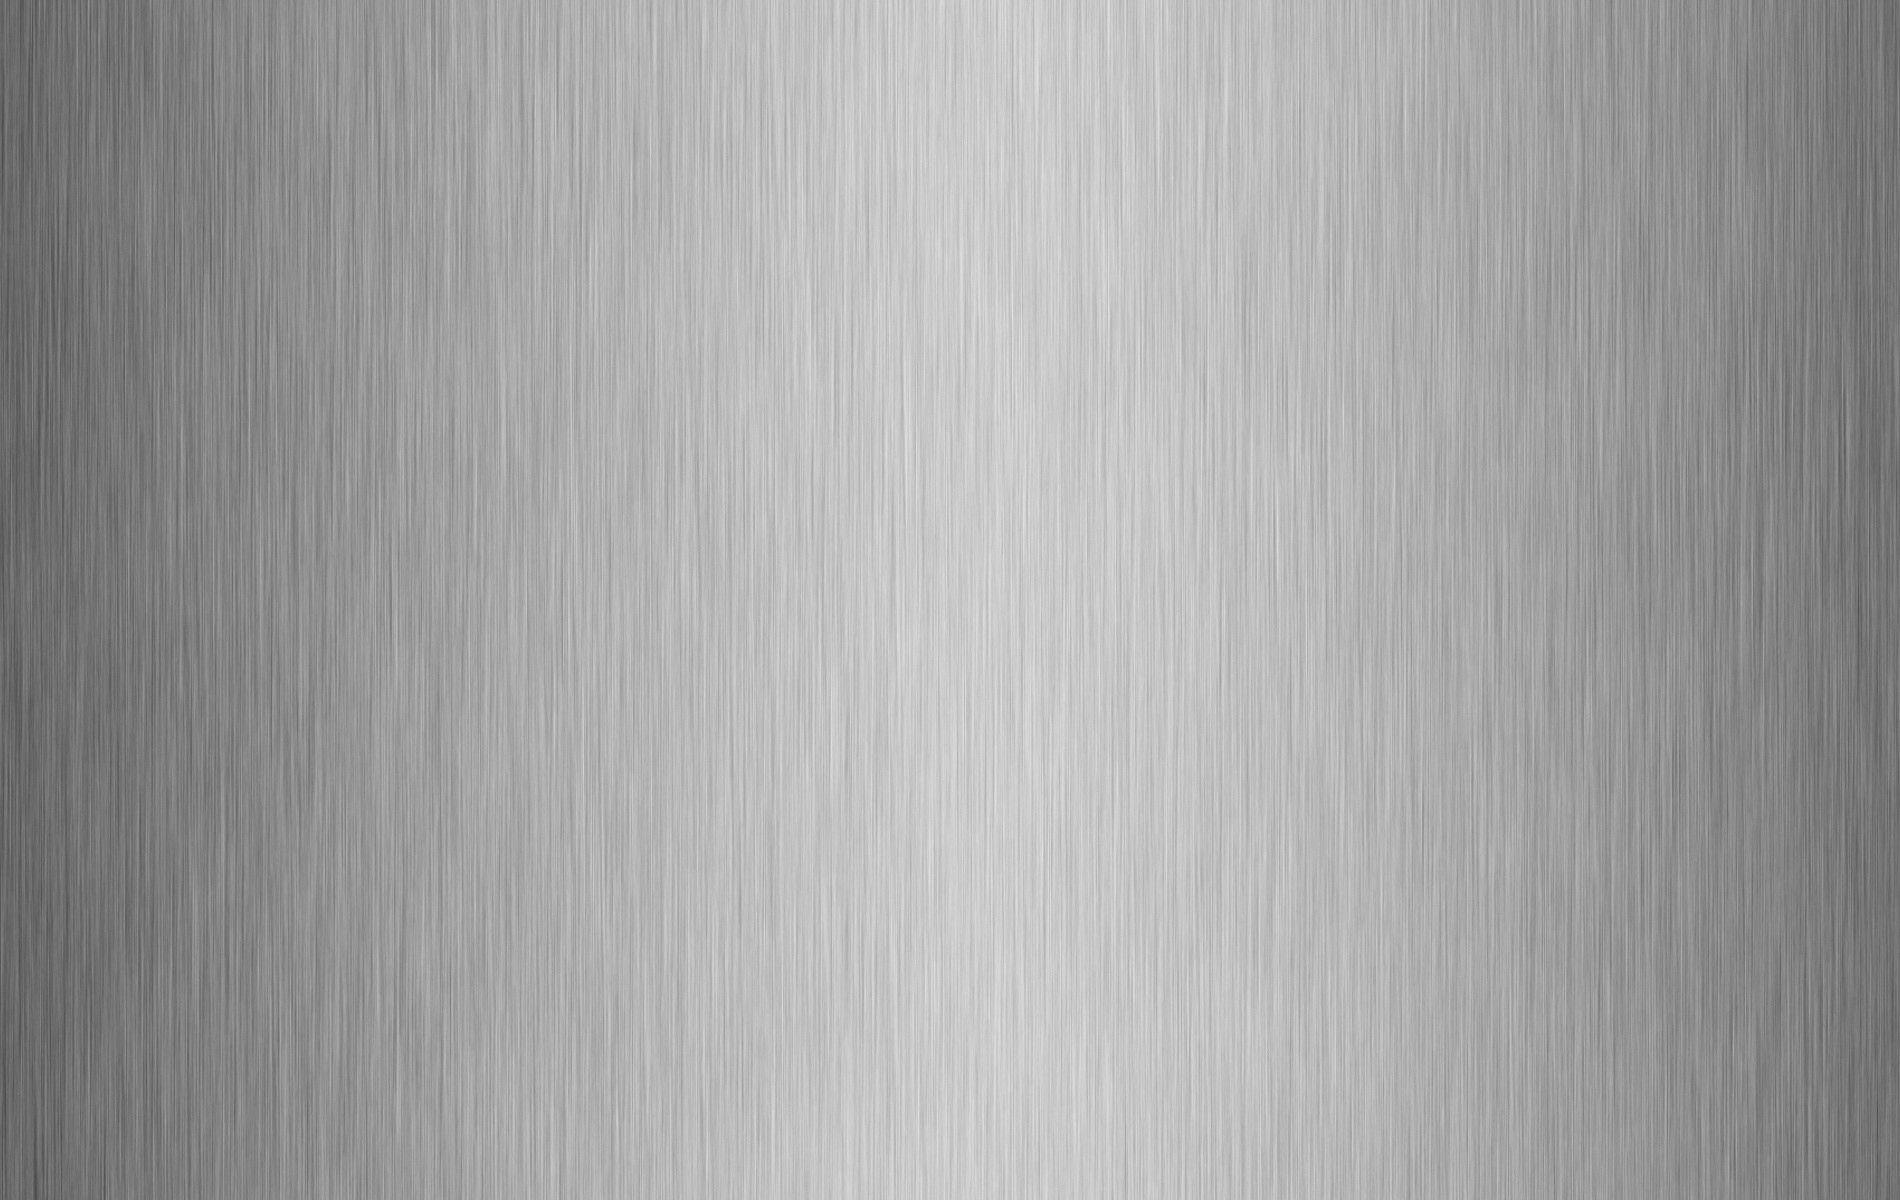 1920x1200 Aluminum Background HD Desktop Wallpapers Amazing HD 1900x1200